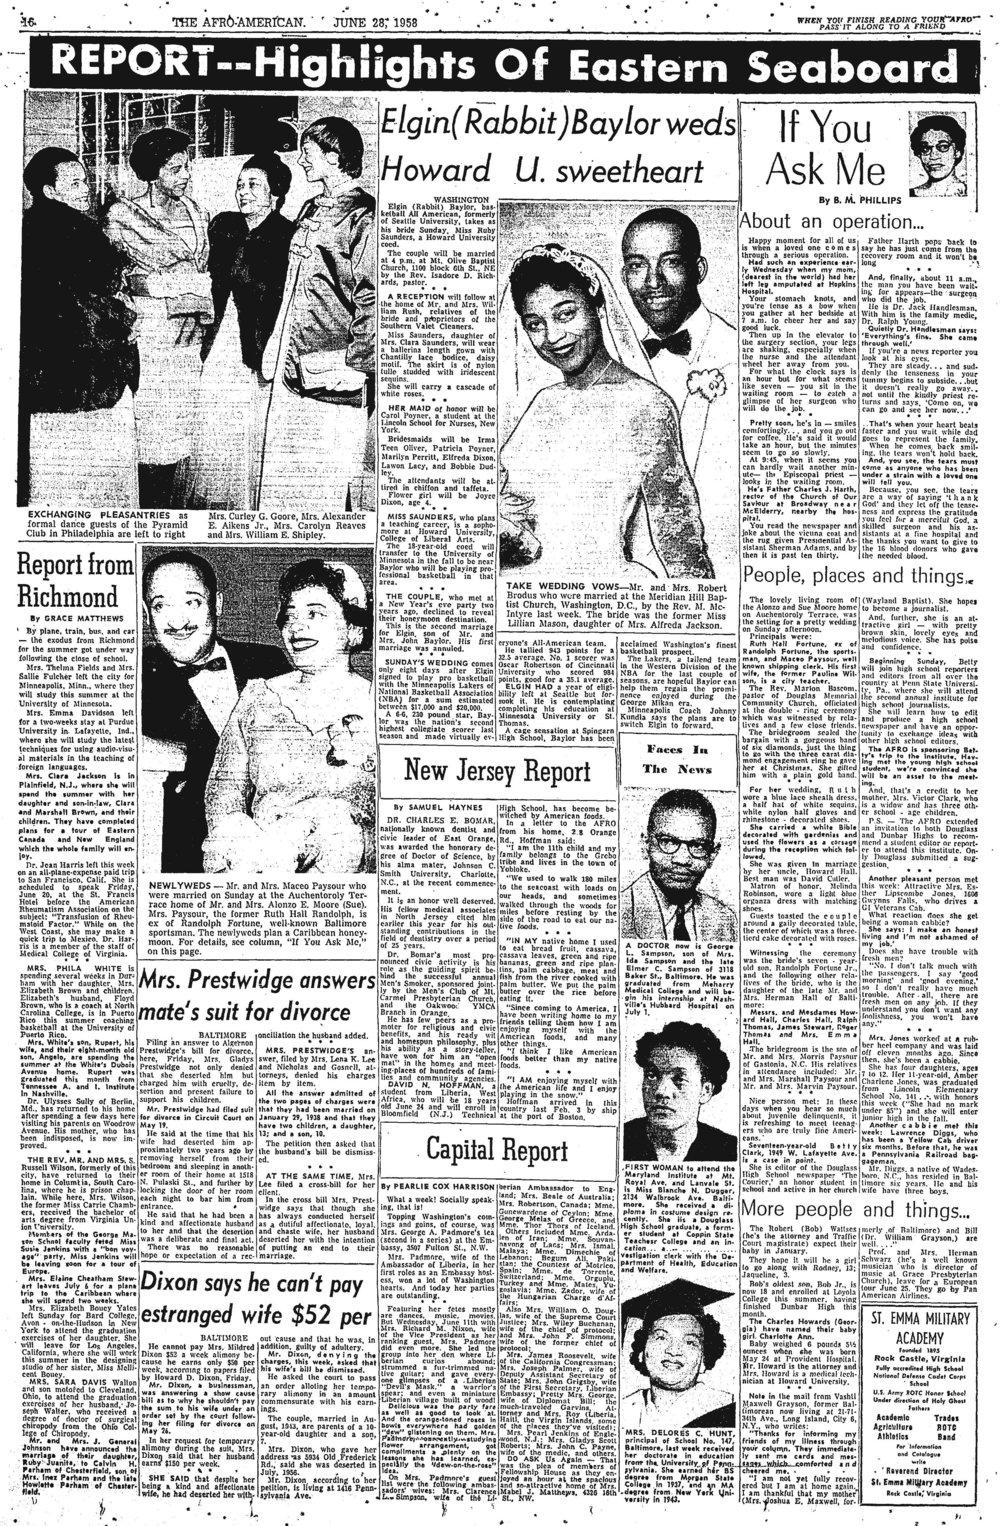 1958-6-28--Faces_i.t_The_News-2.jpg